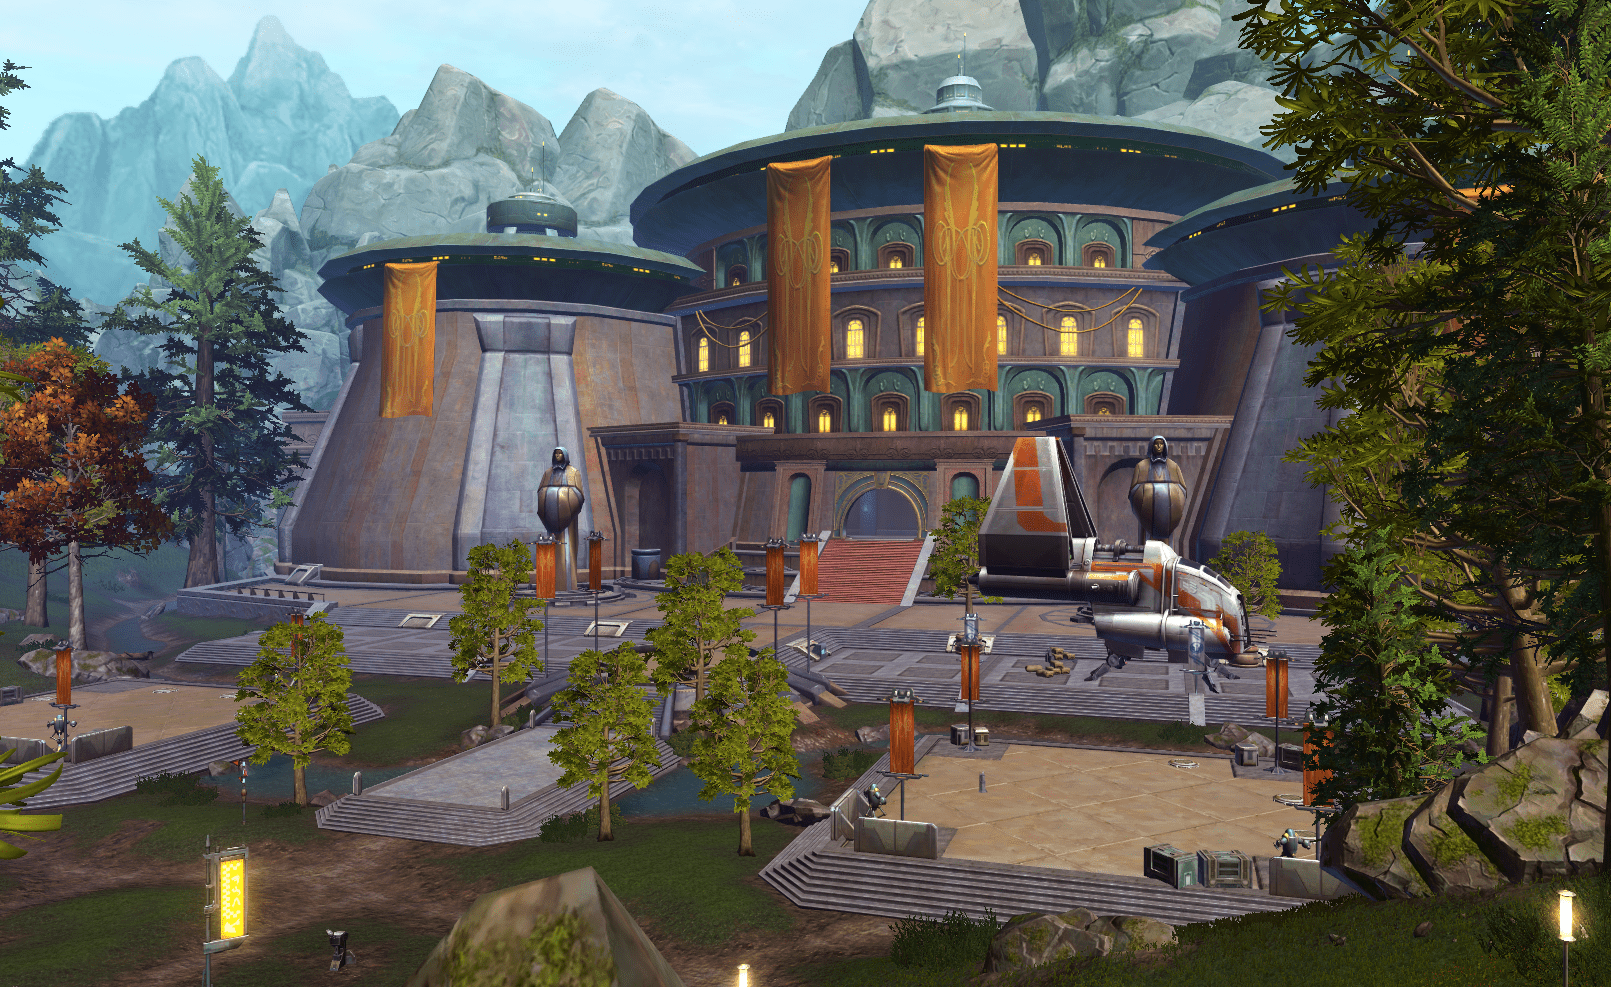 The Mandalorian Season Two The Jedi Tython Temple